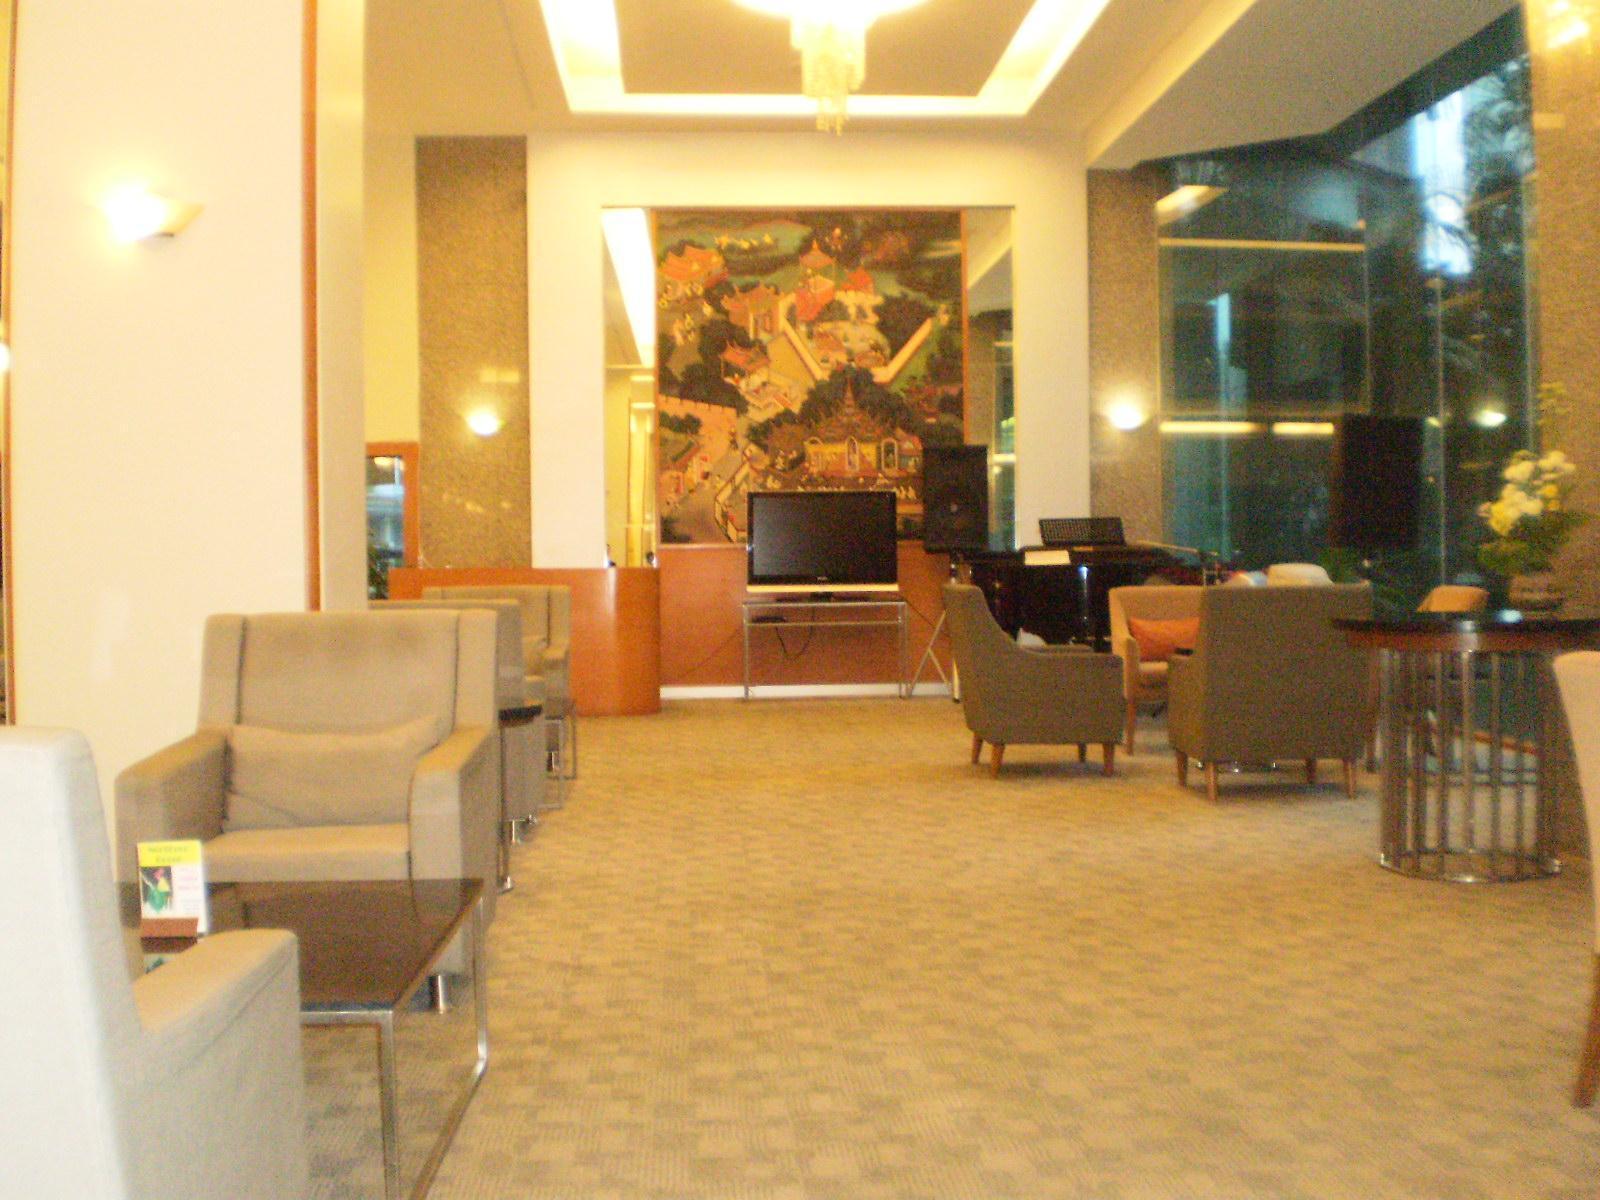 Lanna Palace 2004 Hotel โรงแรมลานนา พาเลซ 2004